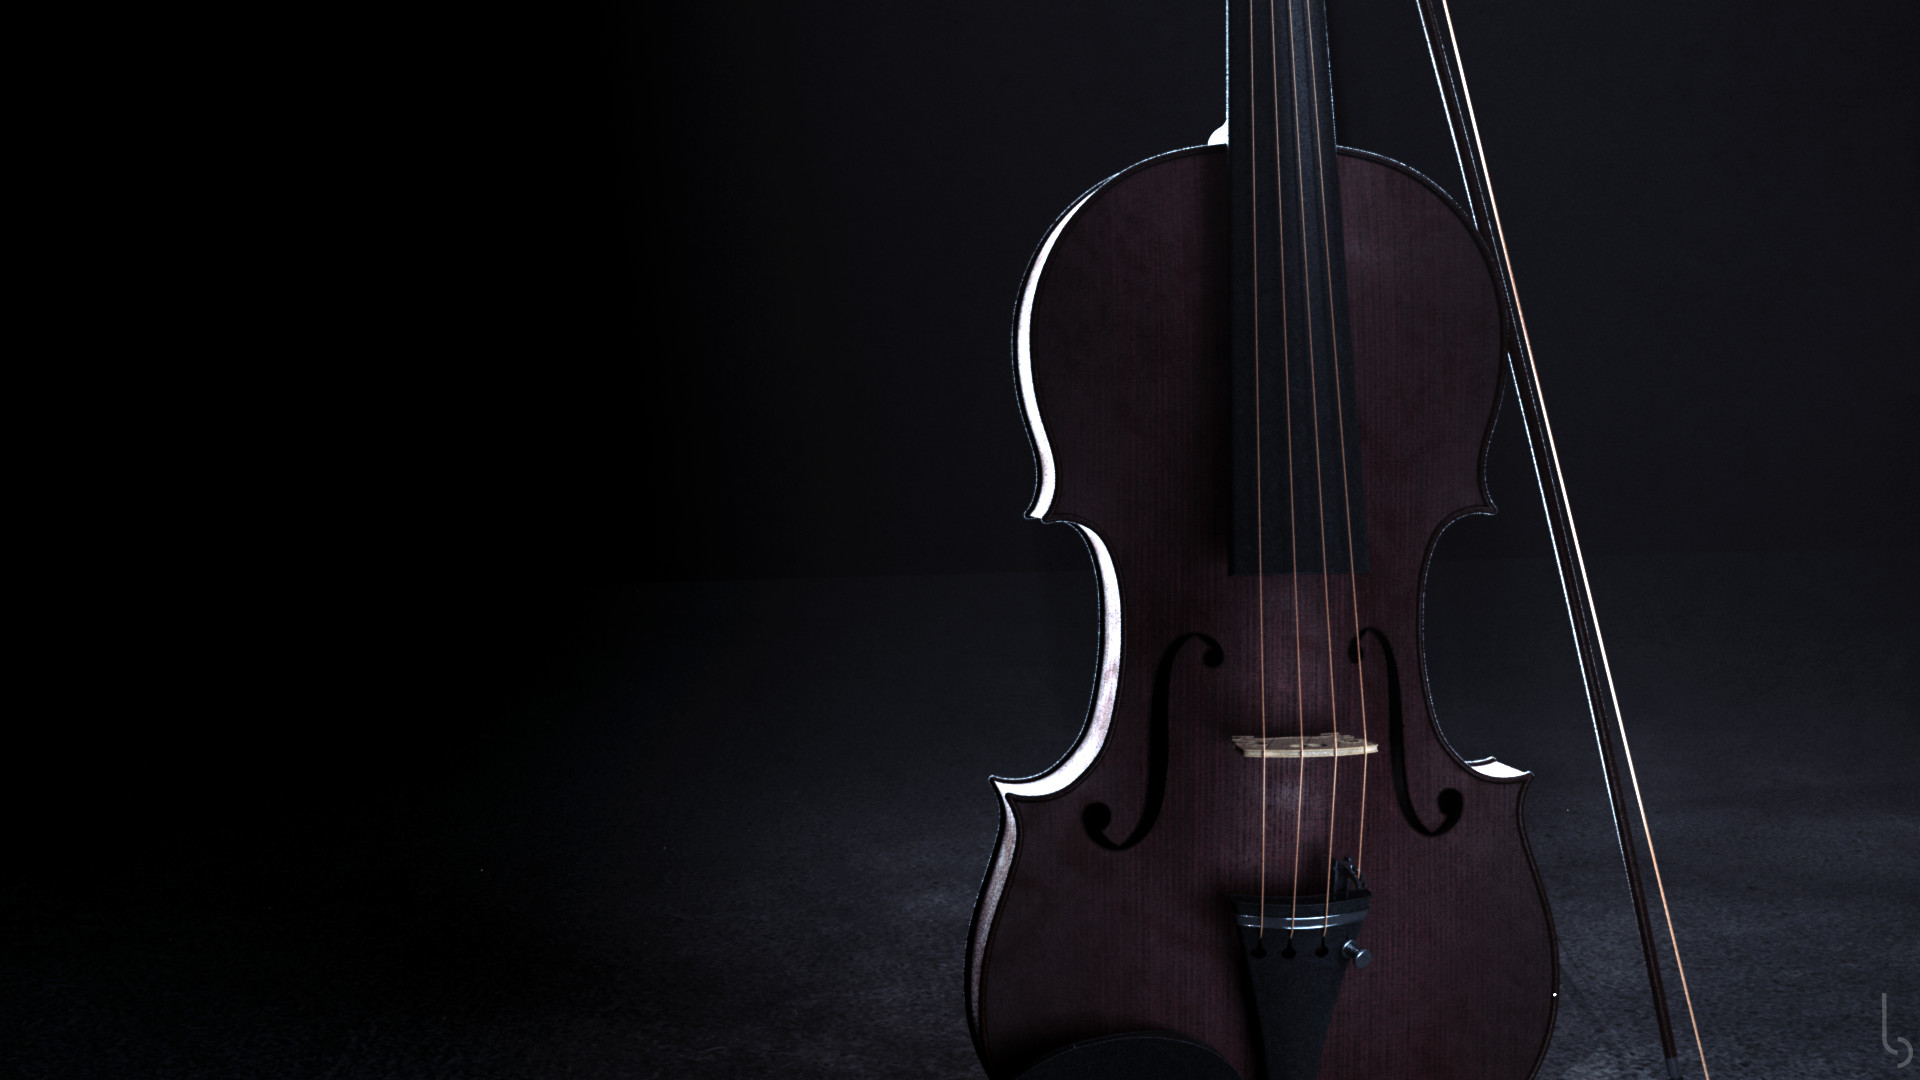 Res: 1920x1080, Leon Berlis Violin